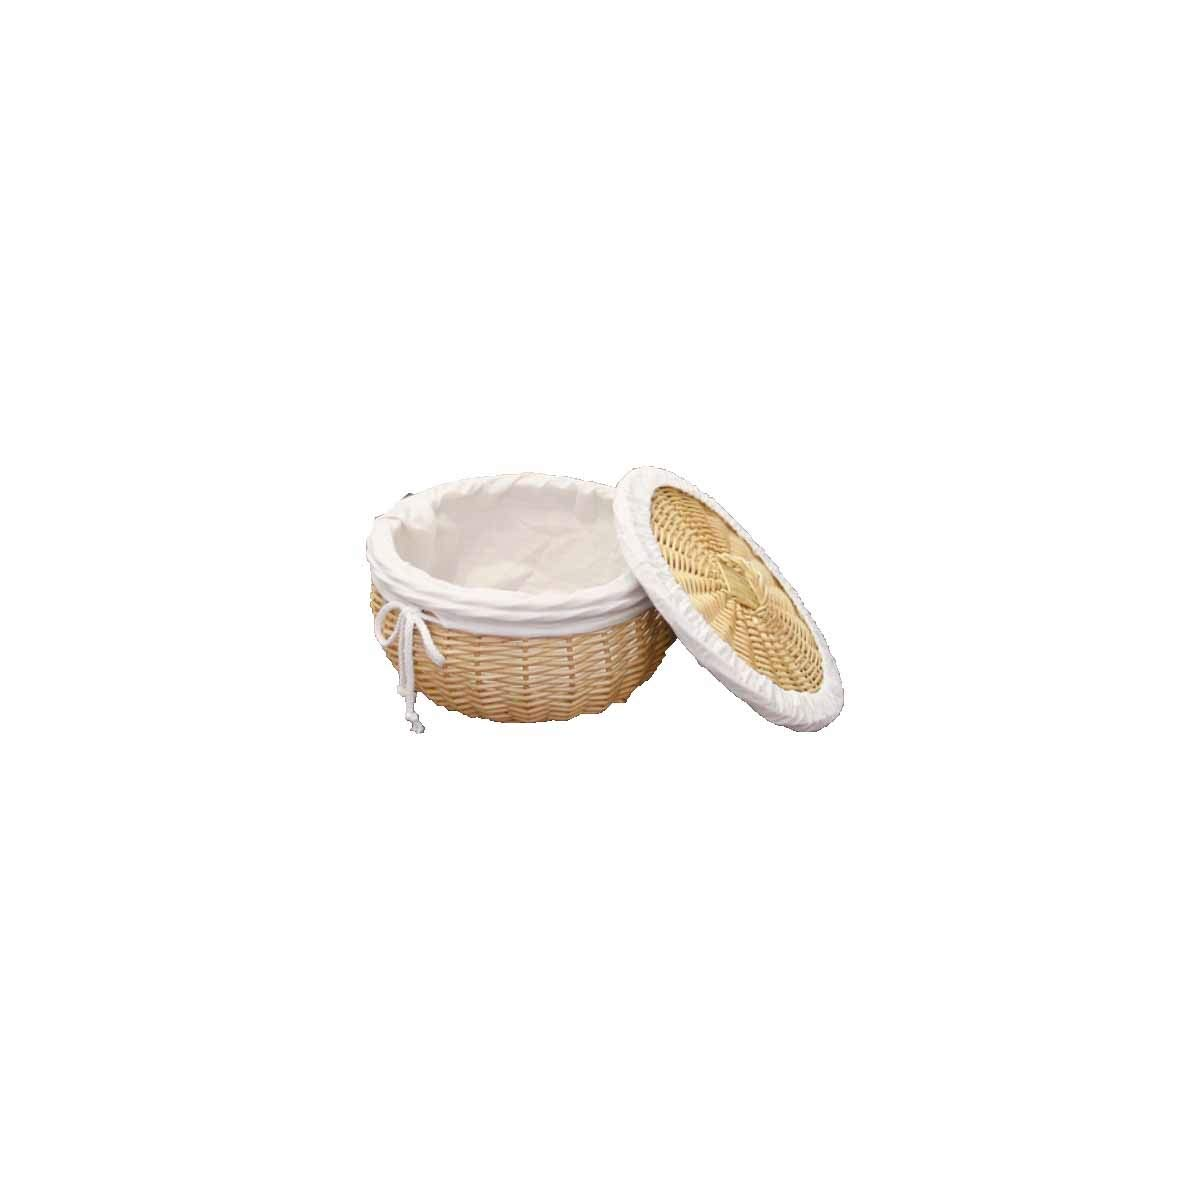 Tongboshi Bread Basket Rattan Steamed Bread Basket with Lid Insulation Wicker Bread Basket Home Restaurant Weaving Egg Basket Decoration Frame Round (Color : White, Size : M)